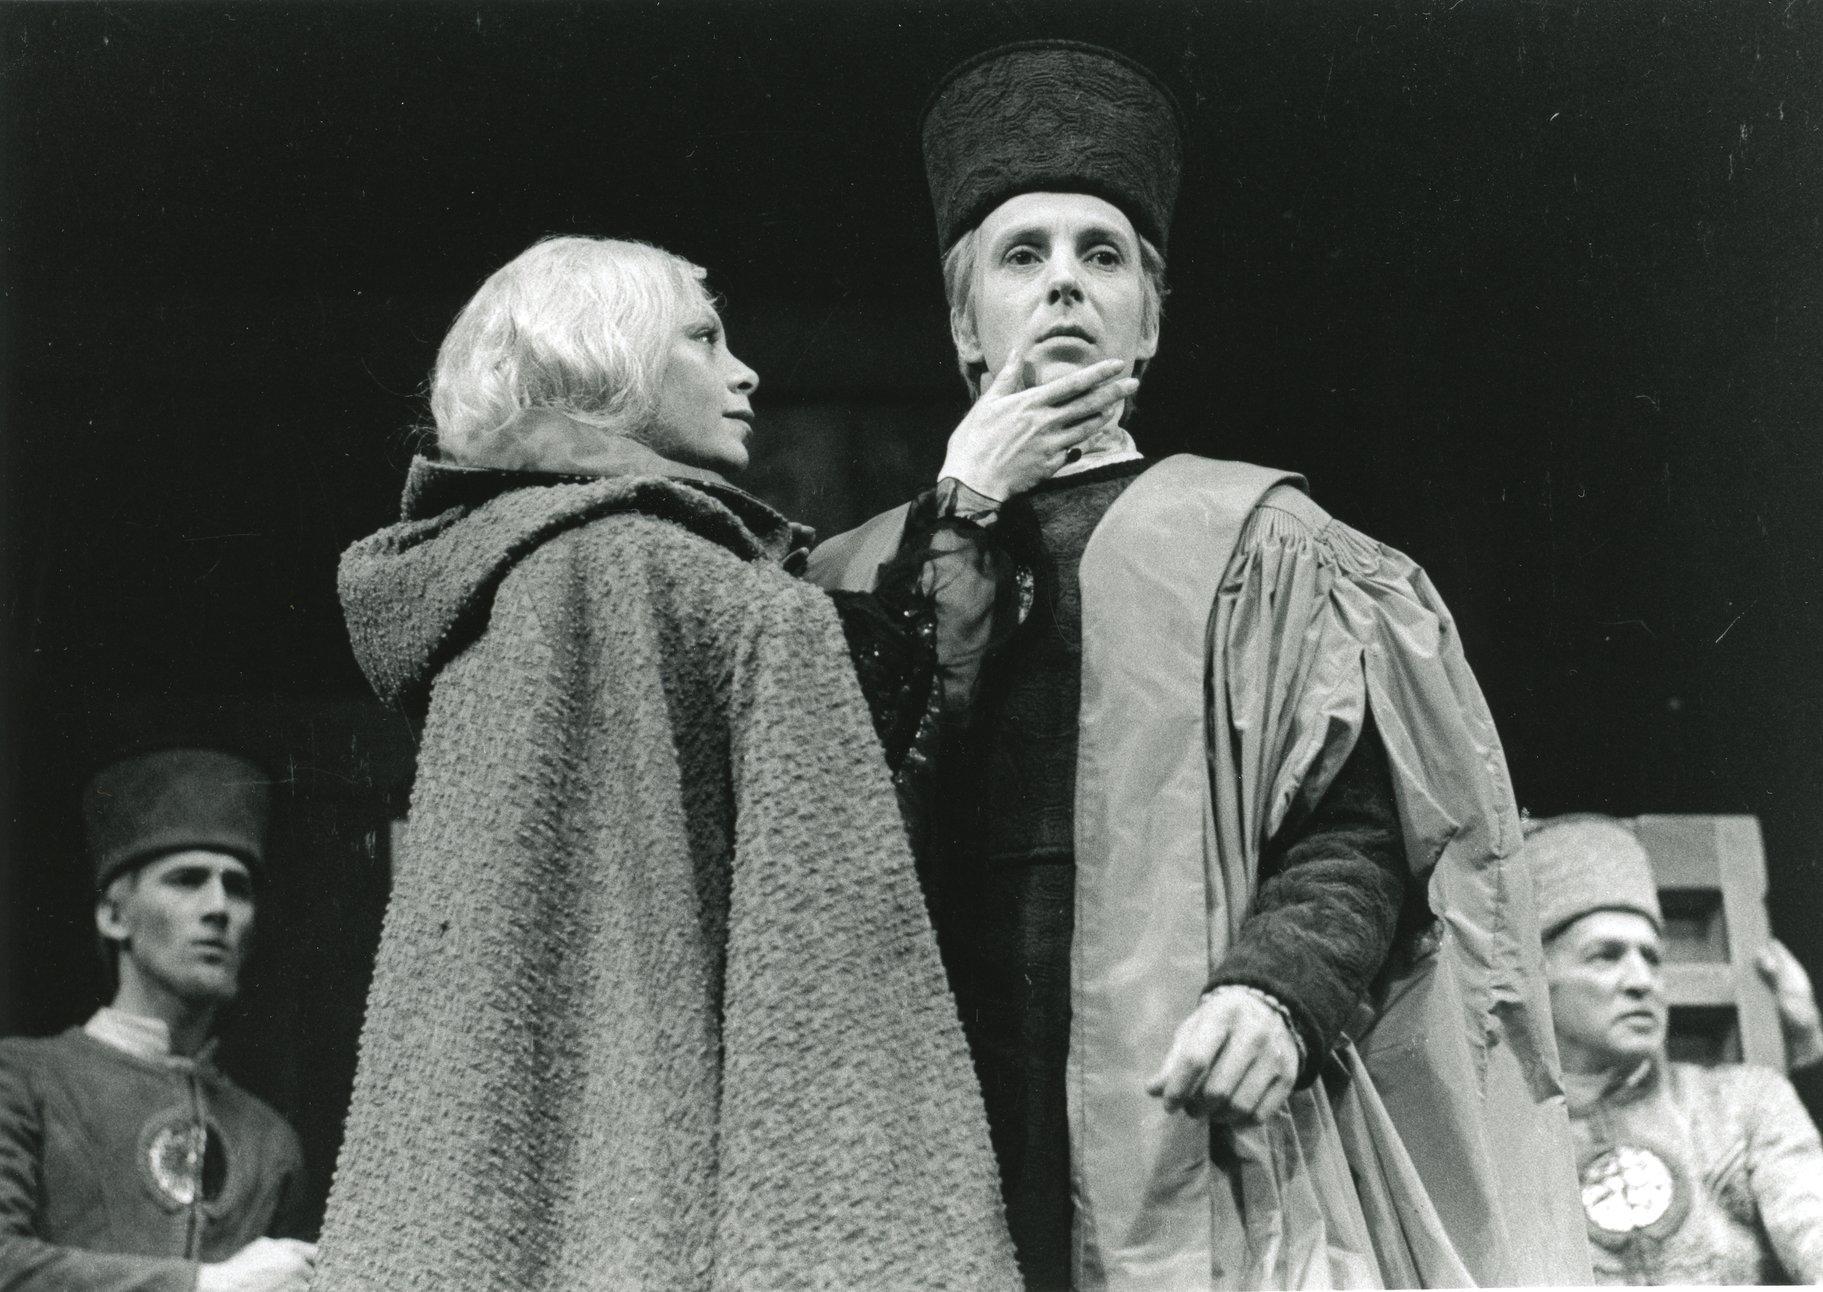 A woman in a cloak strokes a man's face.